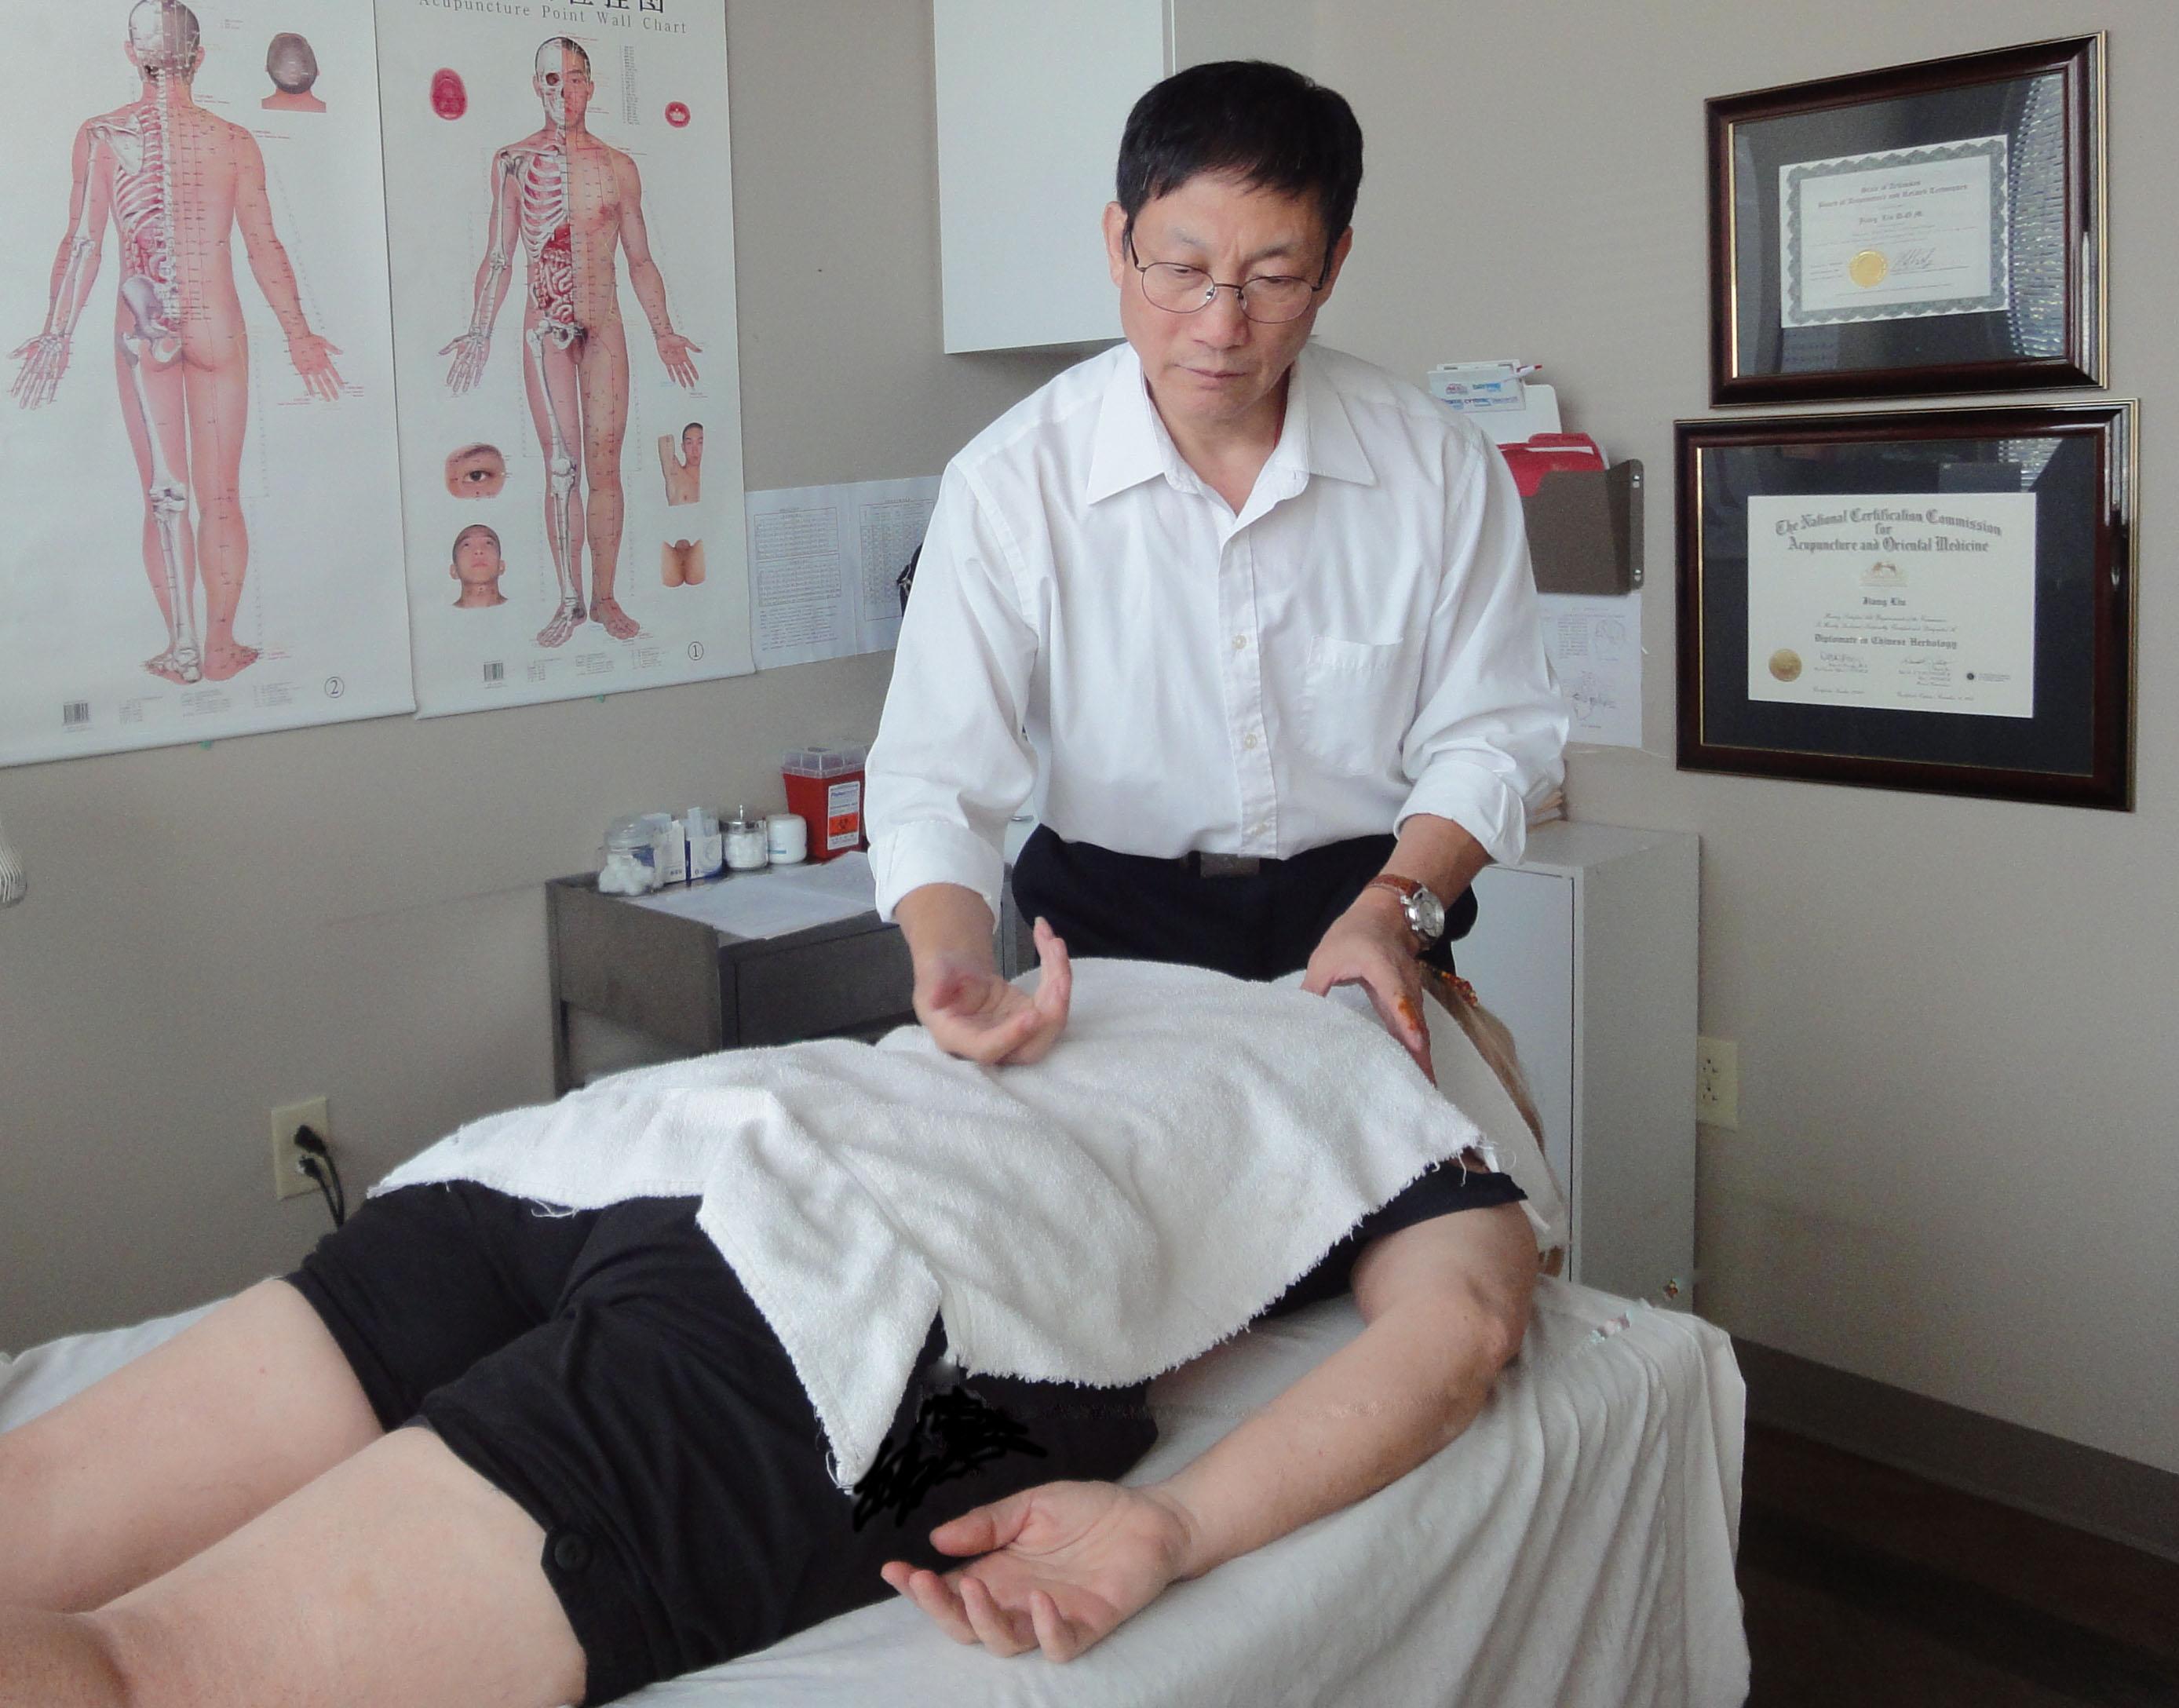 Acupuncture & Chinese Medicine image 5